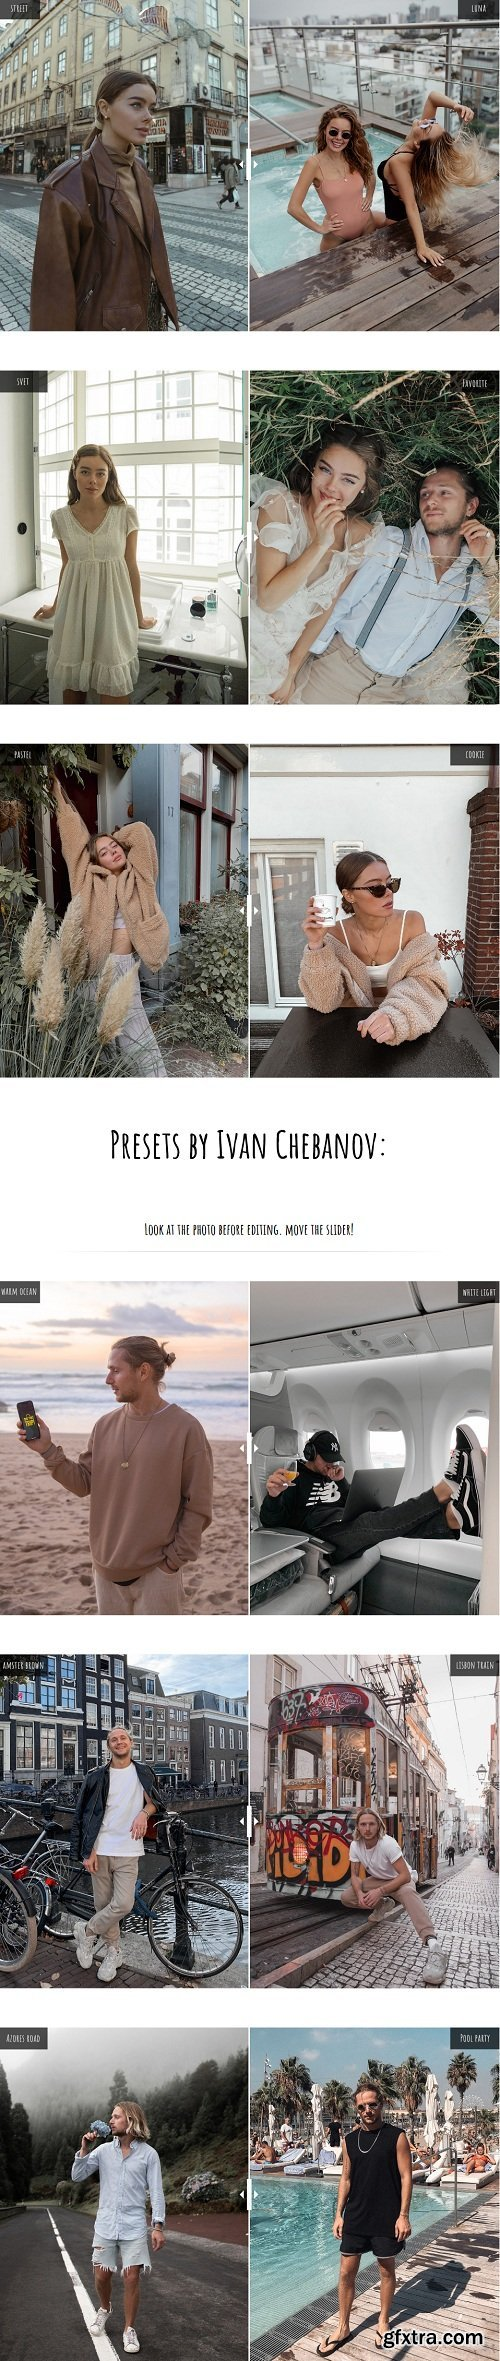 Daria Chebanova Presets